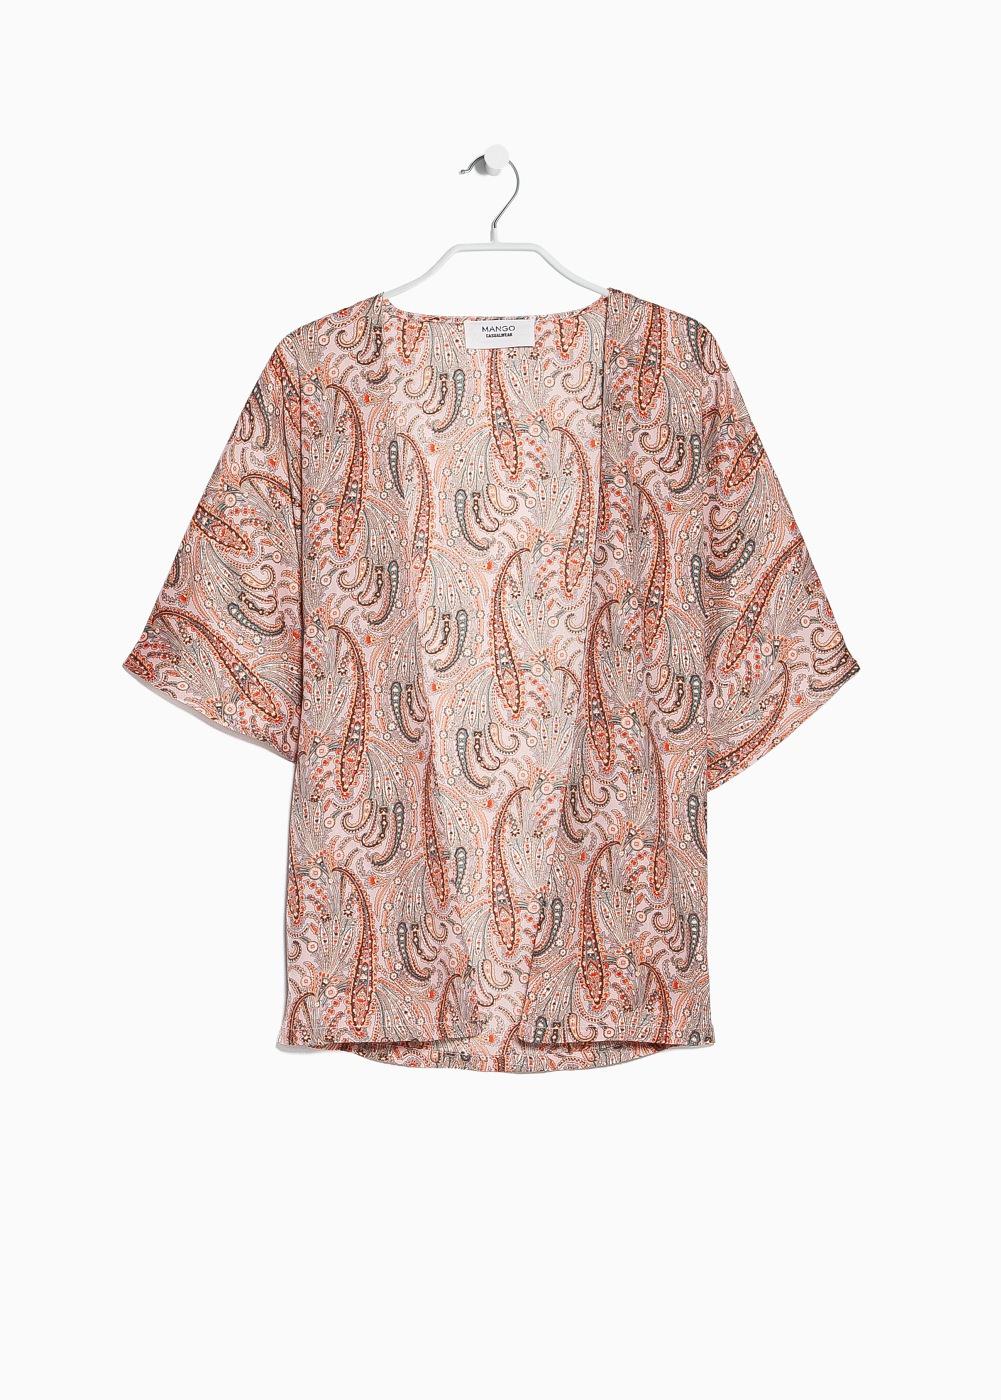 Must Have Maggio 2015 Brand Moda Maison Low High Cost Calzedonia